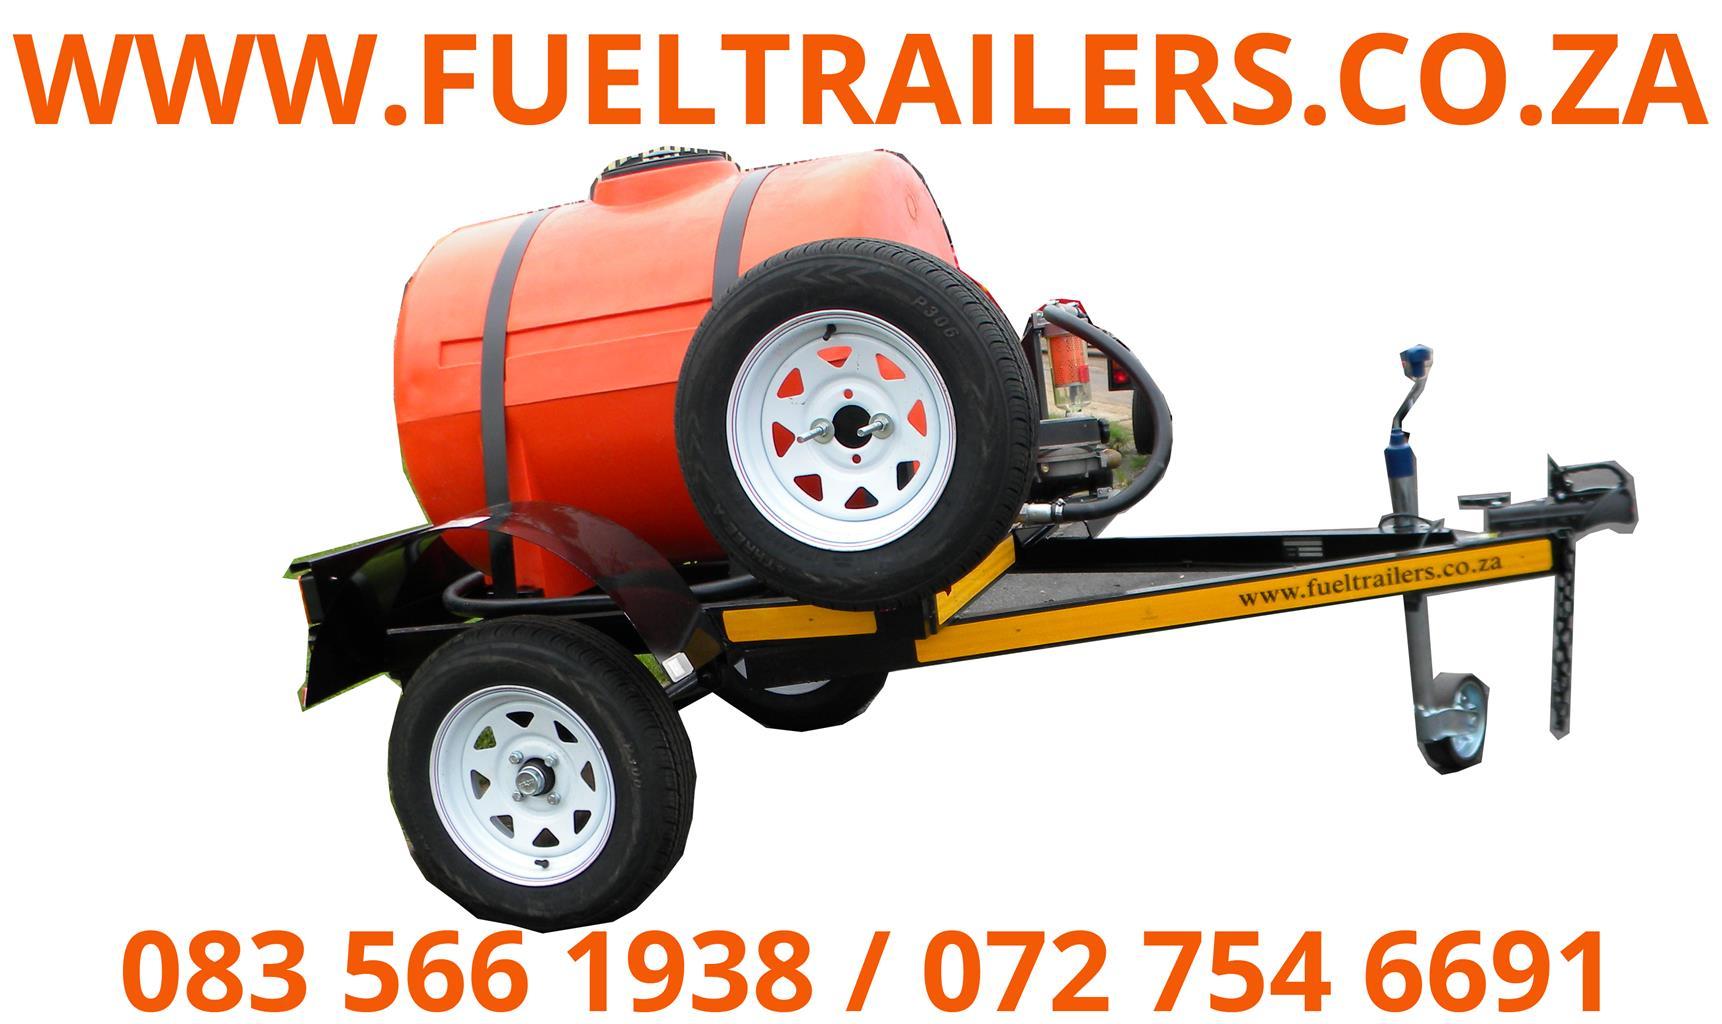 500 litre fuel tanker